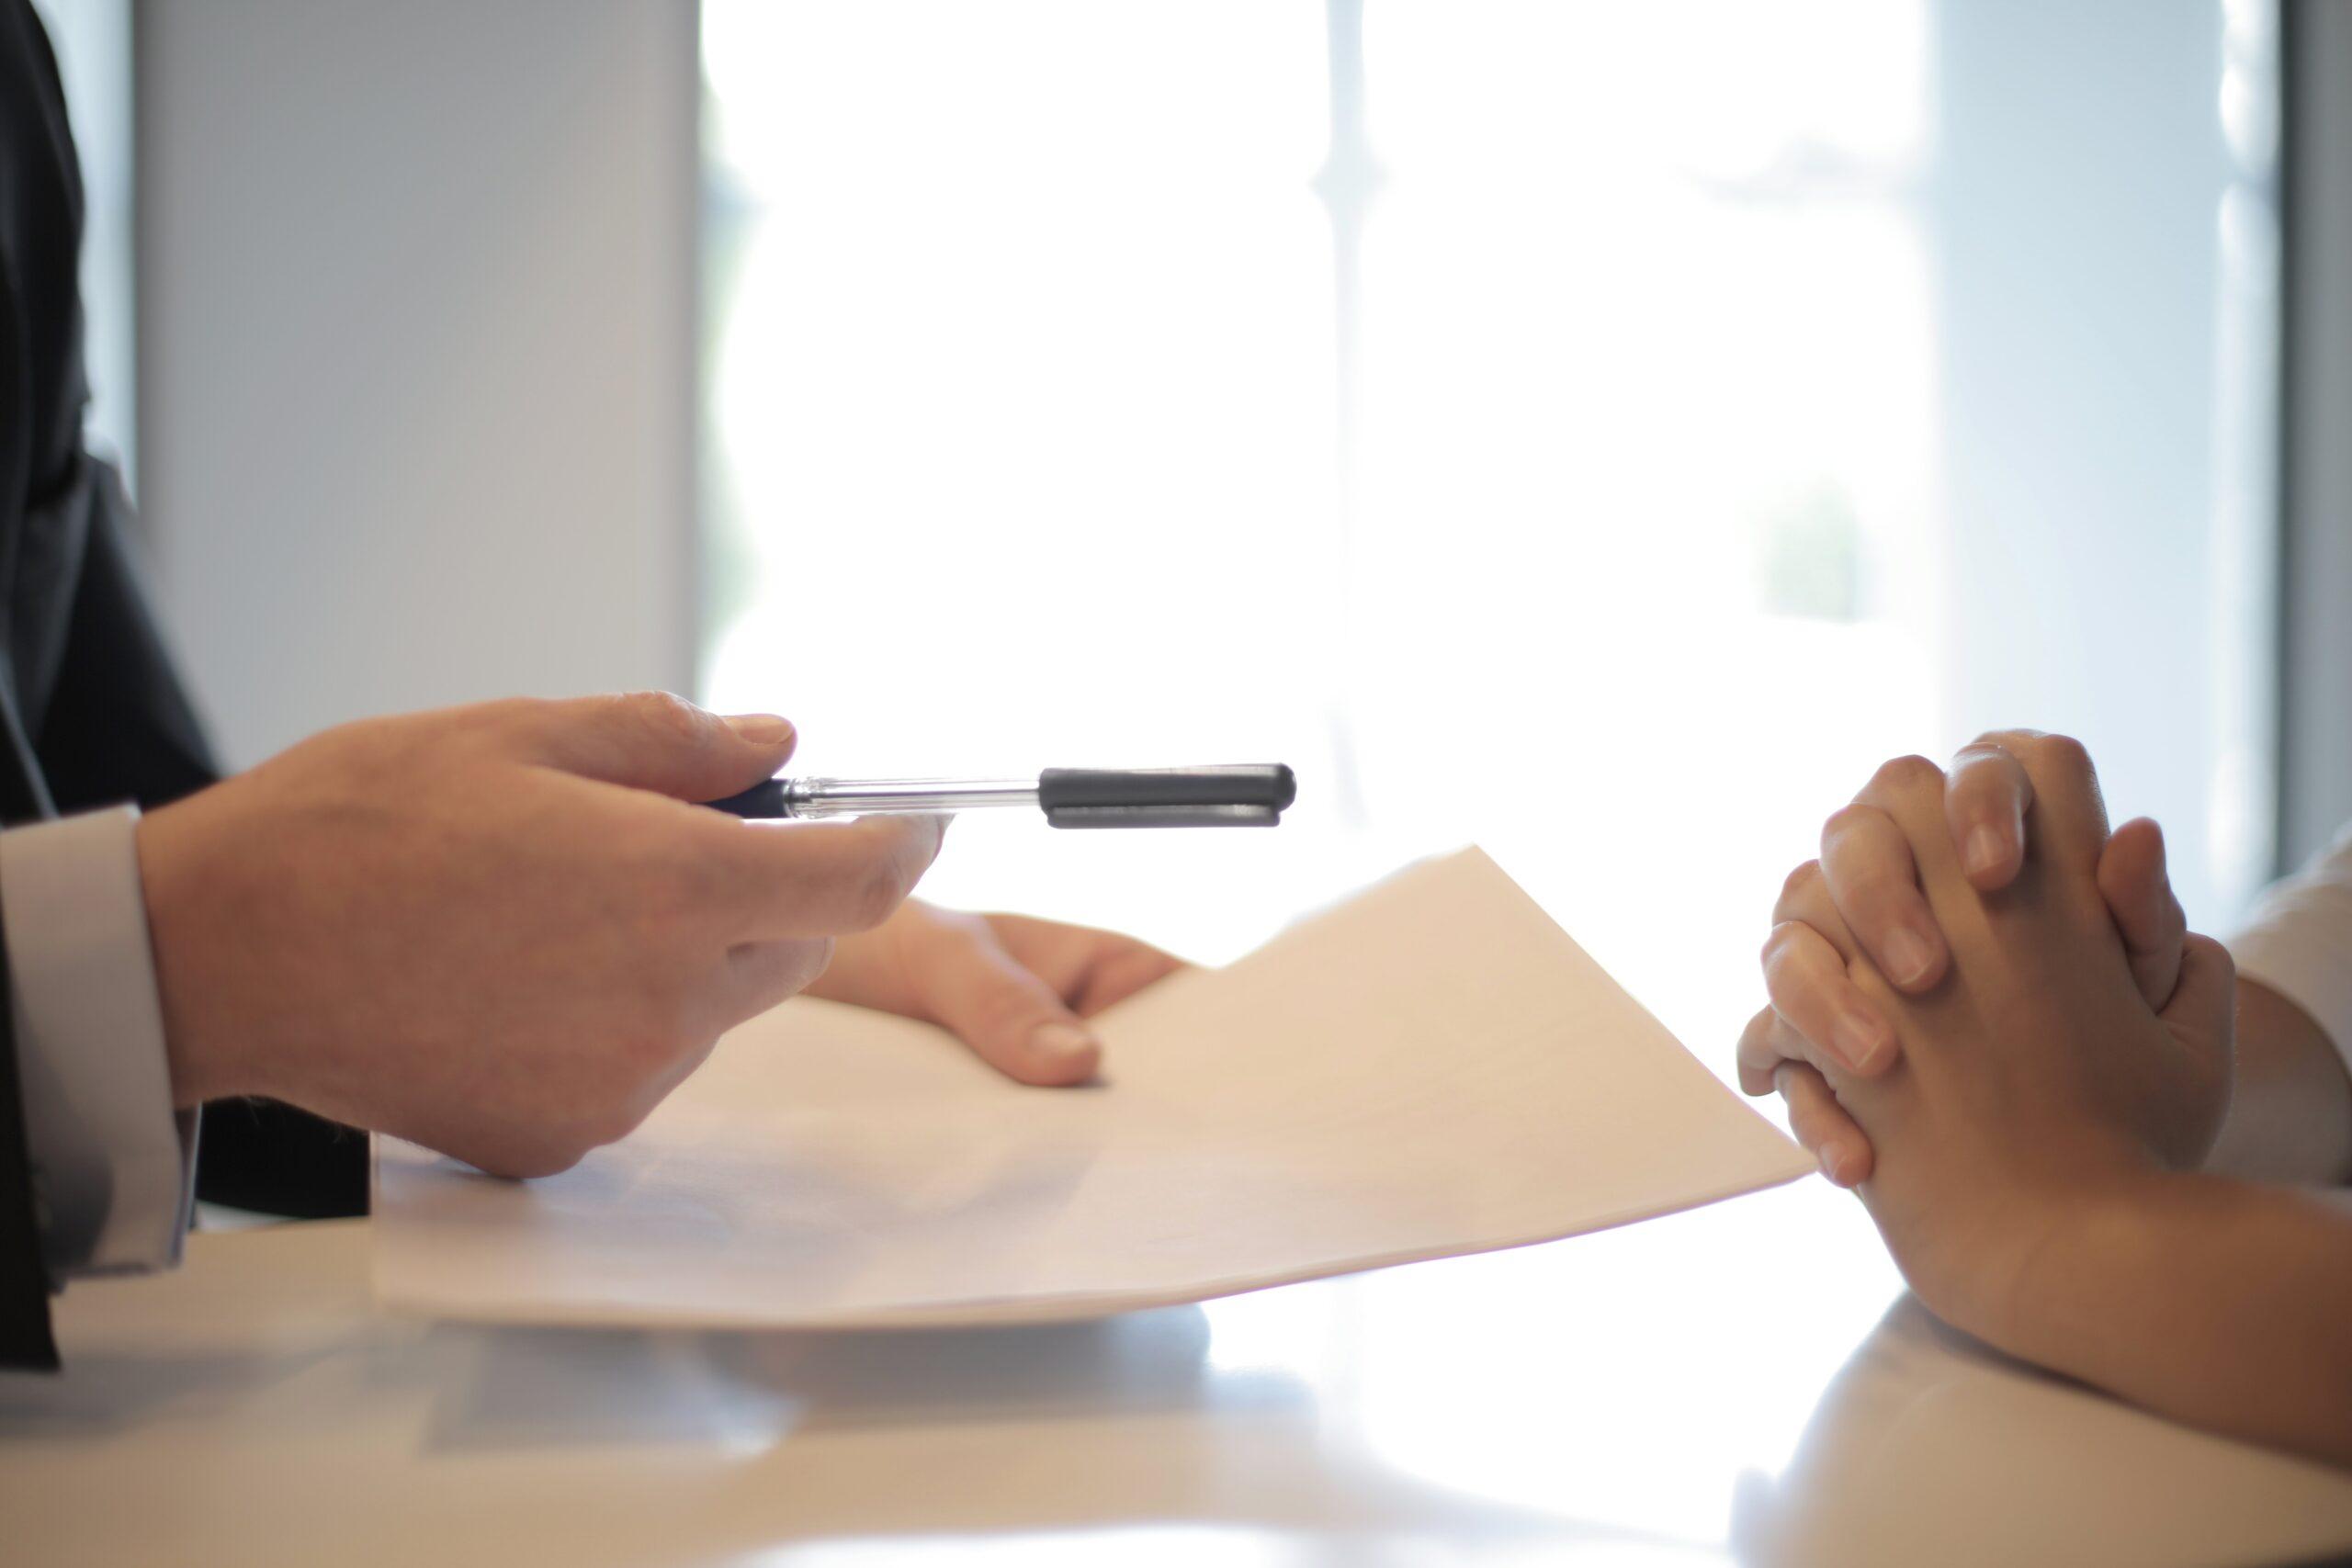 Understanding Pennsylvania's 15/30/5 Auto Insurance Policy